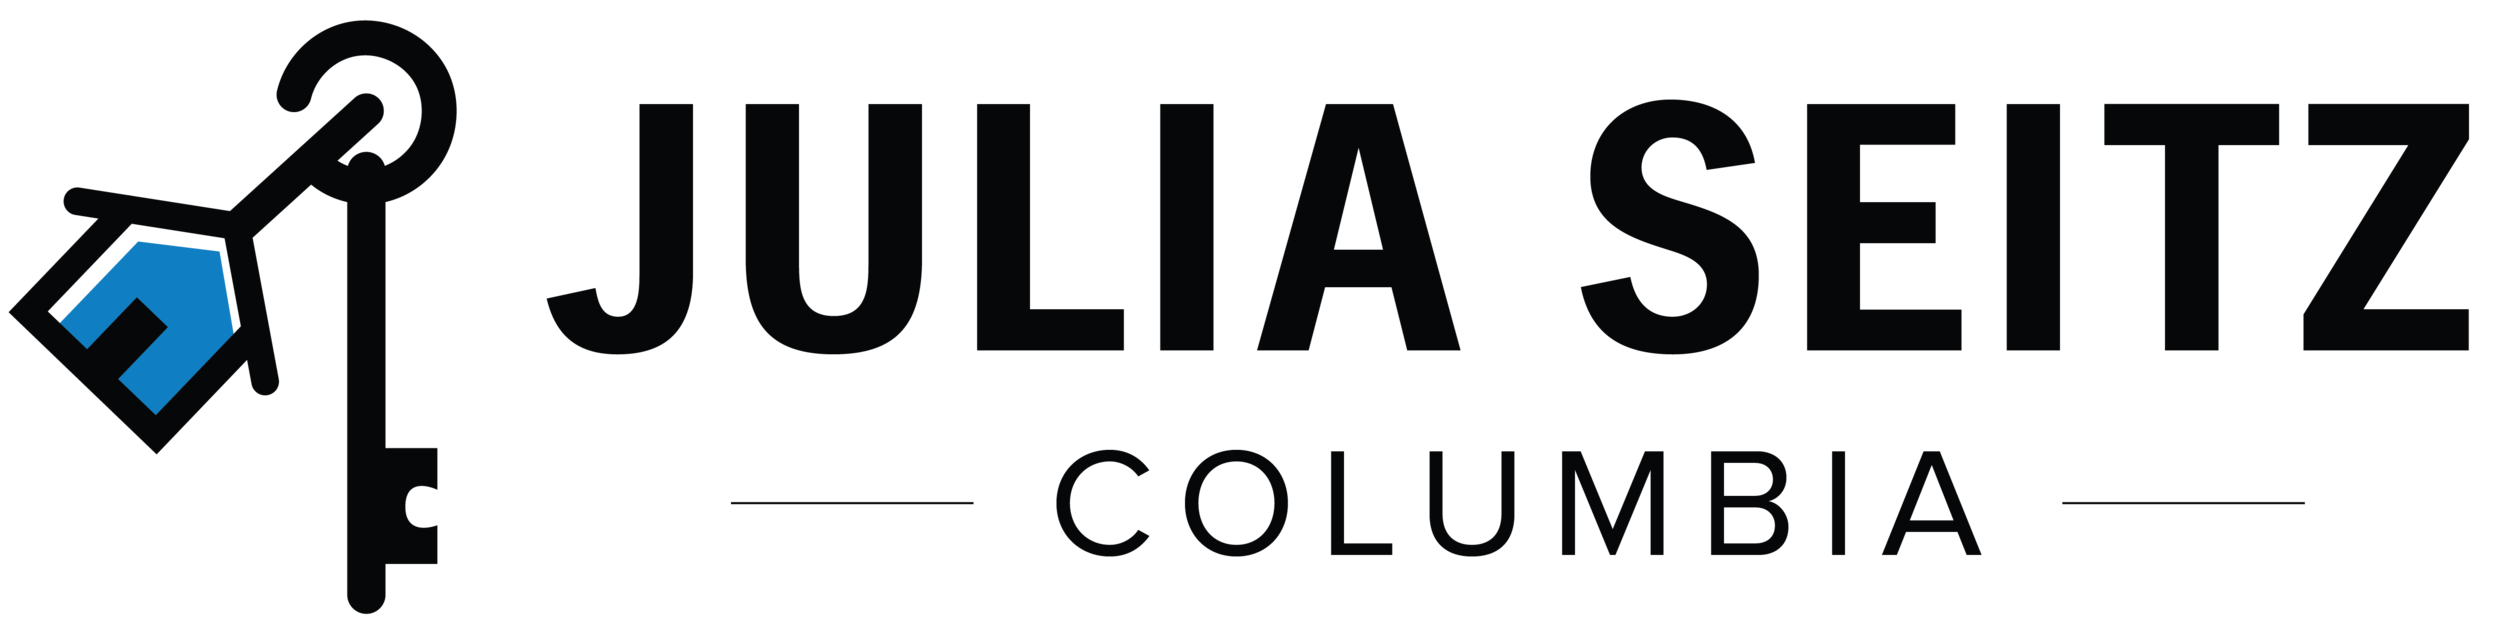 Julia Logo 3@2x.png